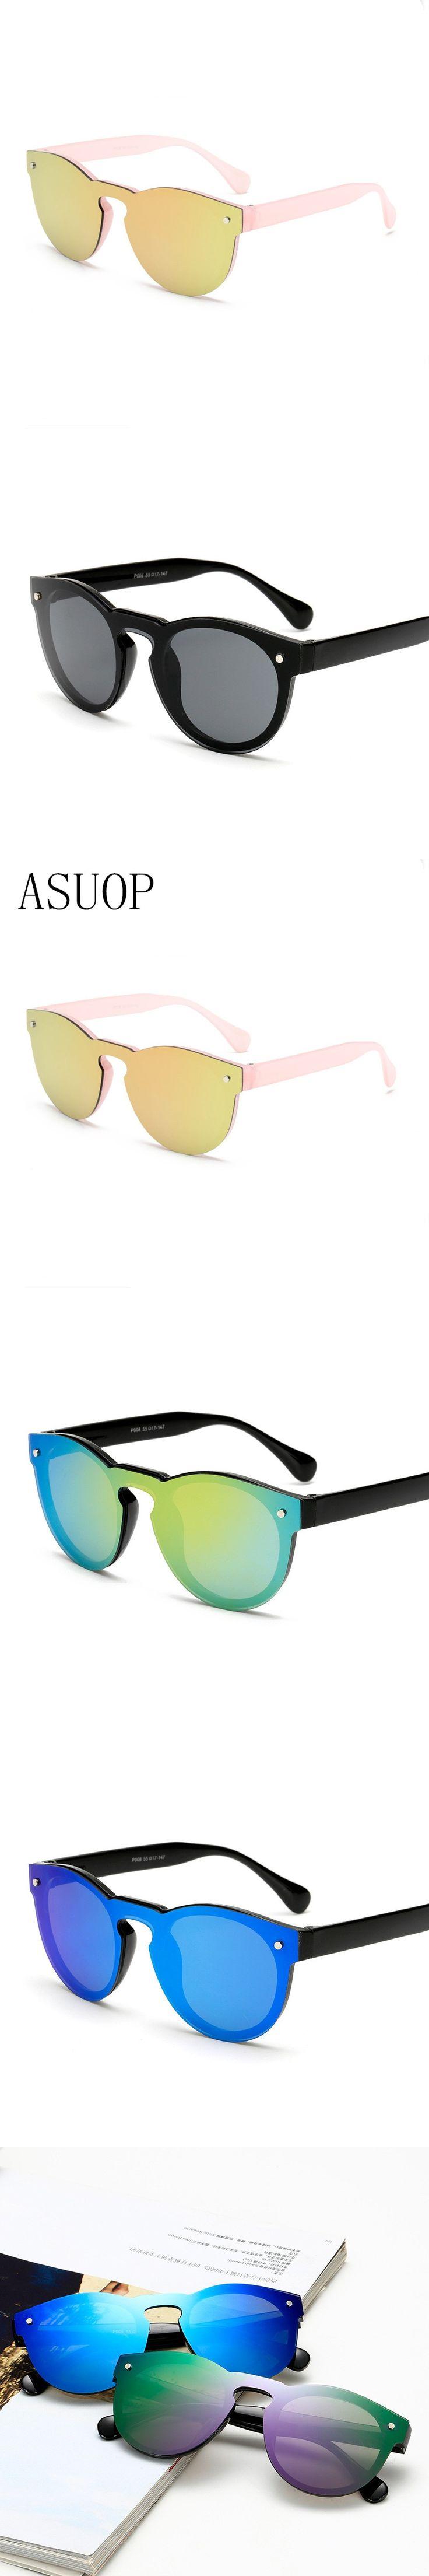 ASUOPNew Fashion Cat Eye Sunglasses Women White Frame Gradient Sun Glasses Driving Eyewear  glasses Coating Mirror oculos gafas